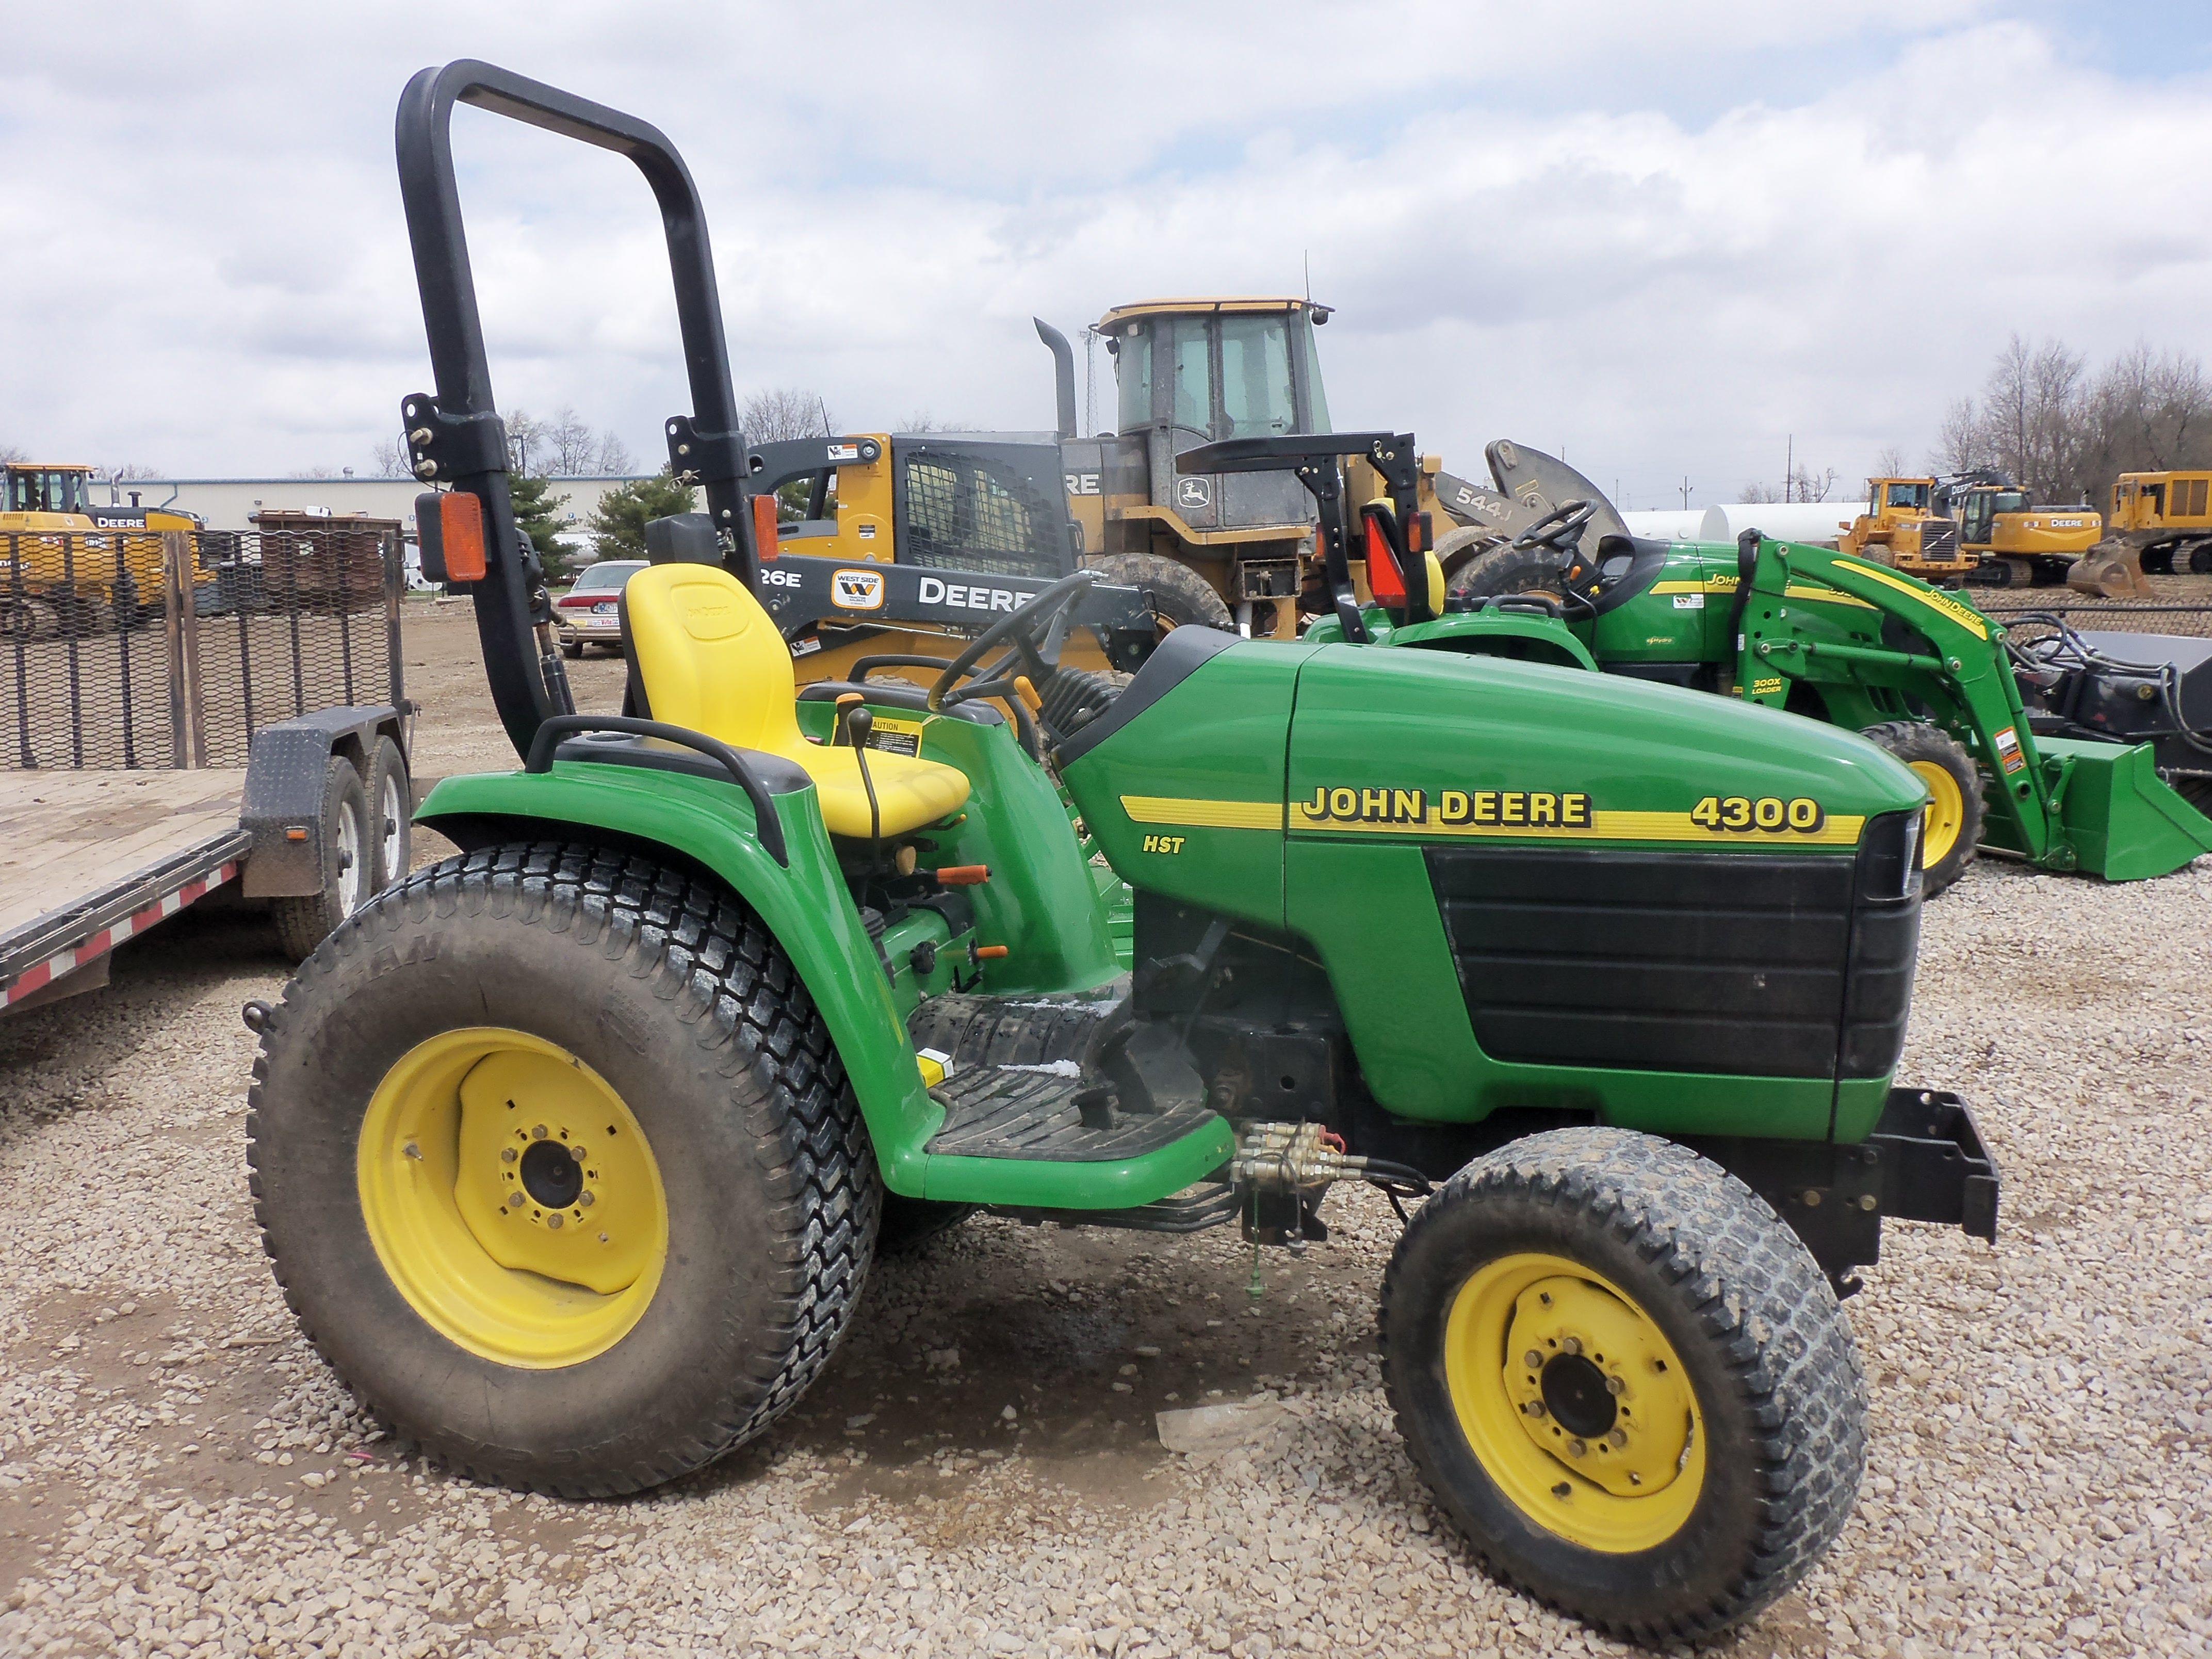 John Deere 4300 compact diesel tractor